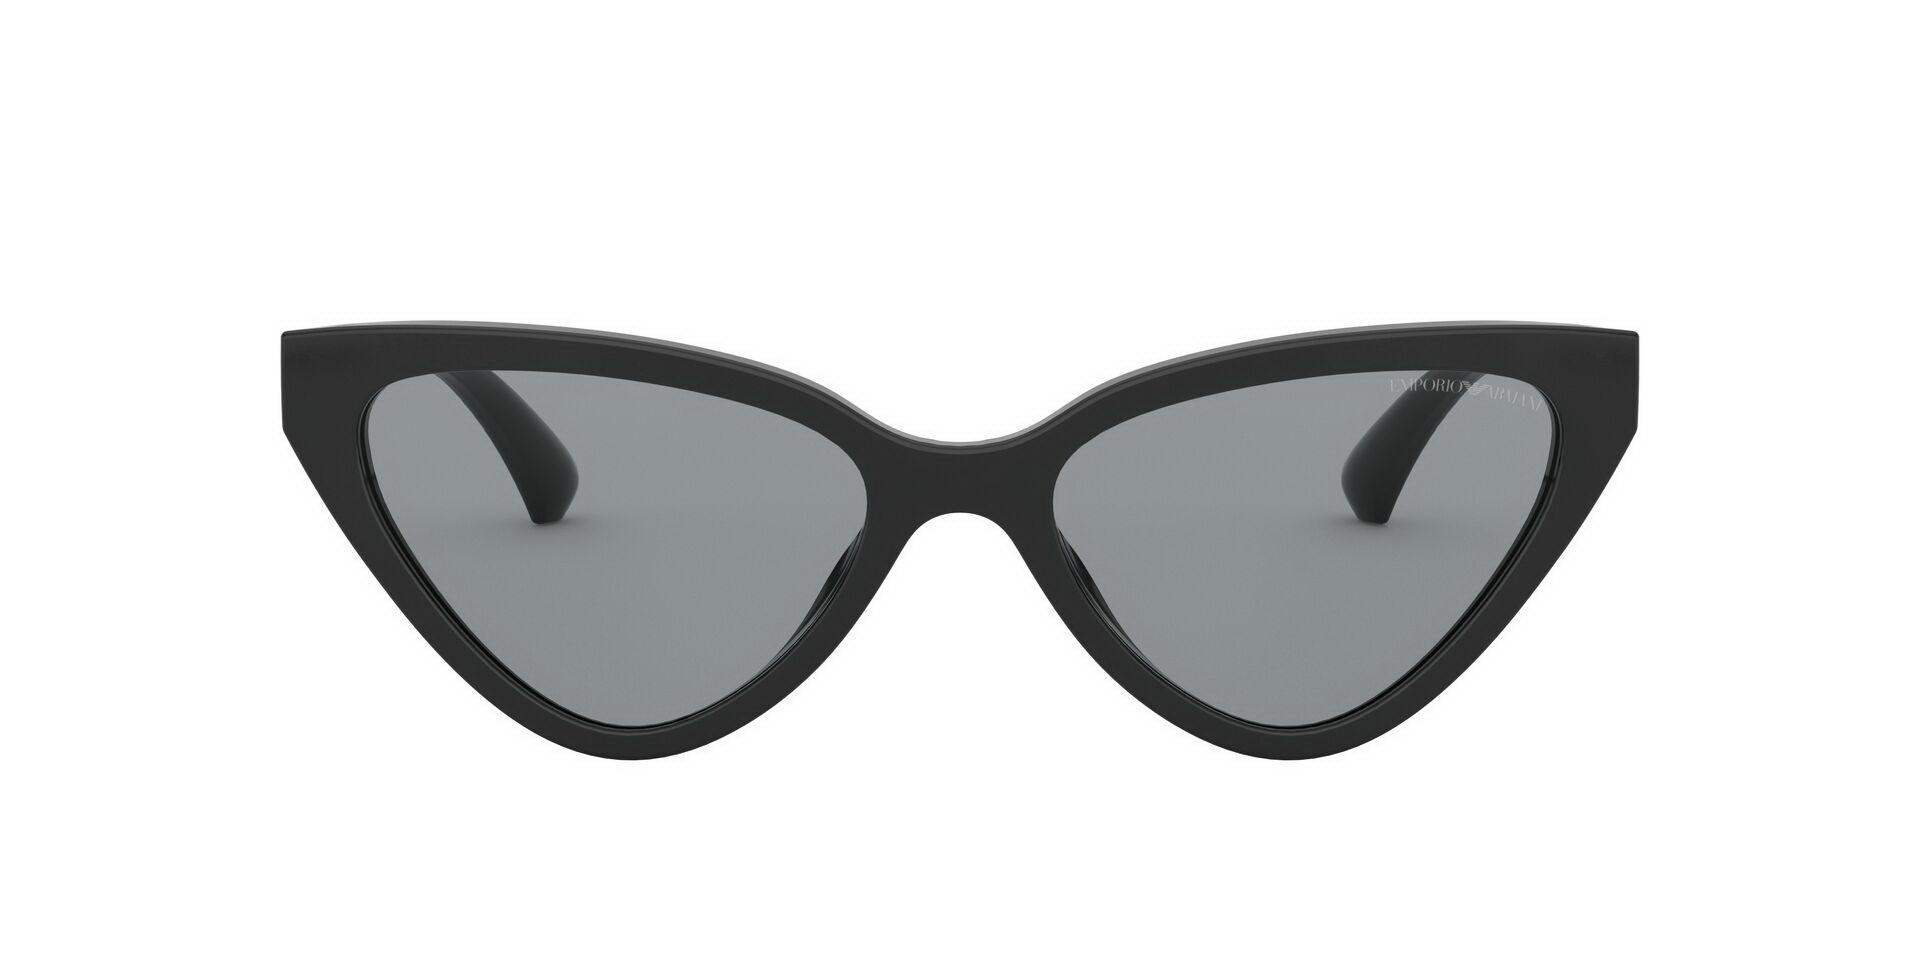 Солнцезащитные очки Очки с/з Emporio Armani 0EA4136 500187